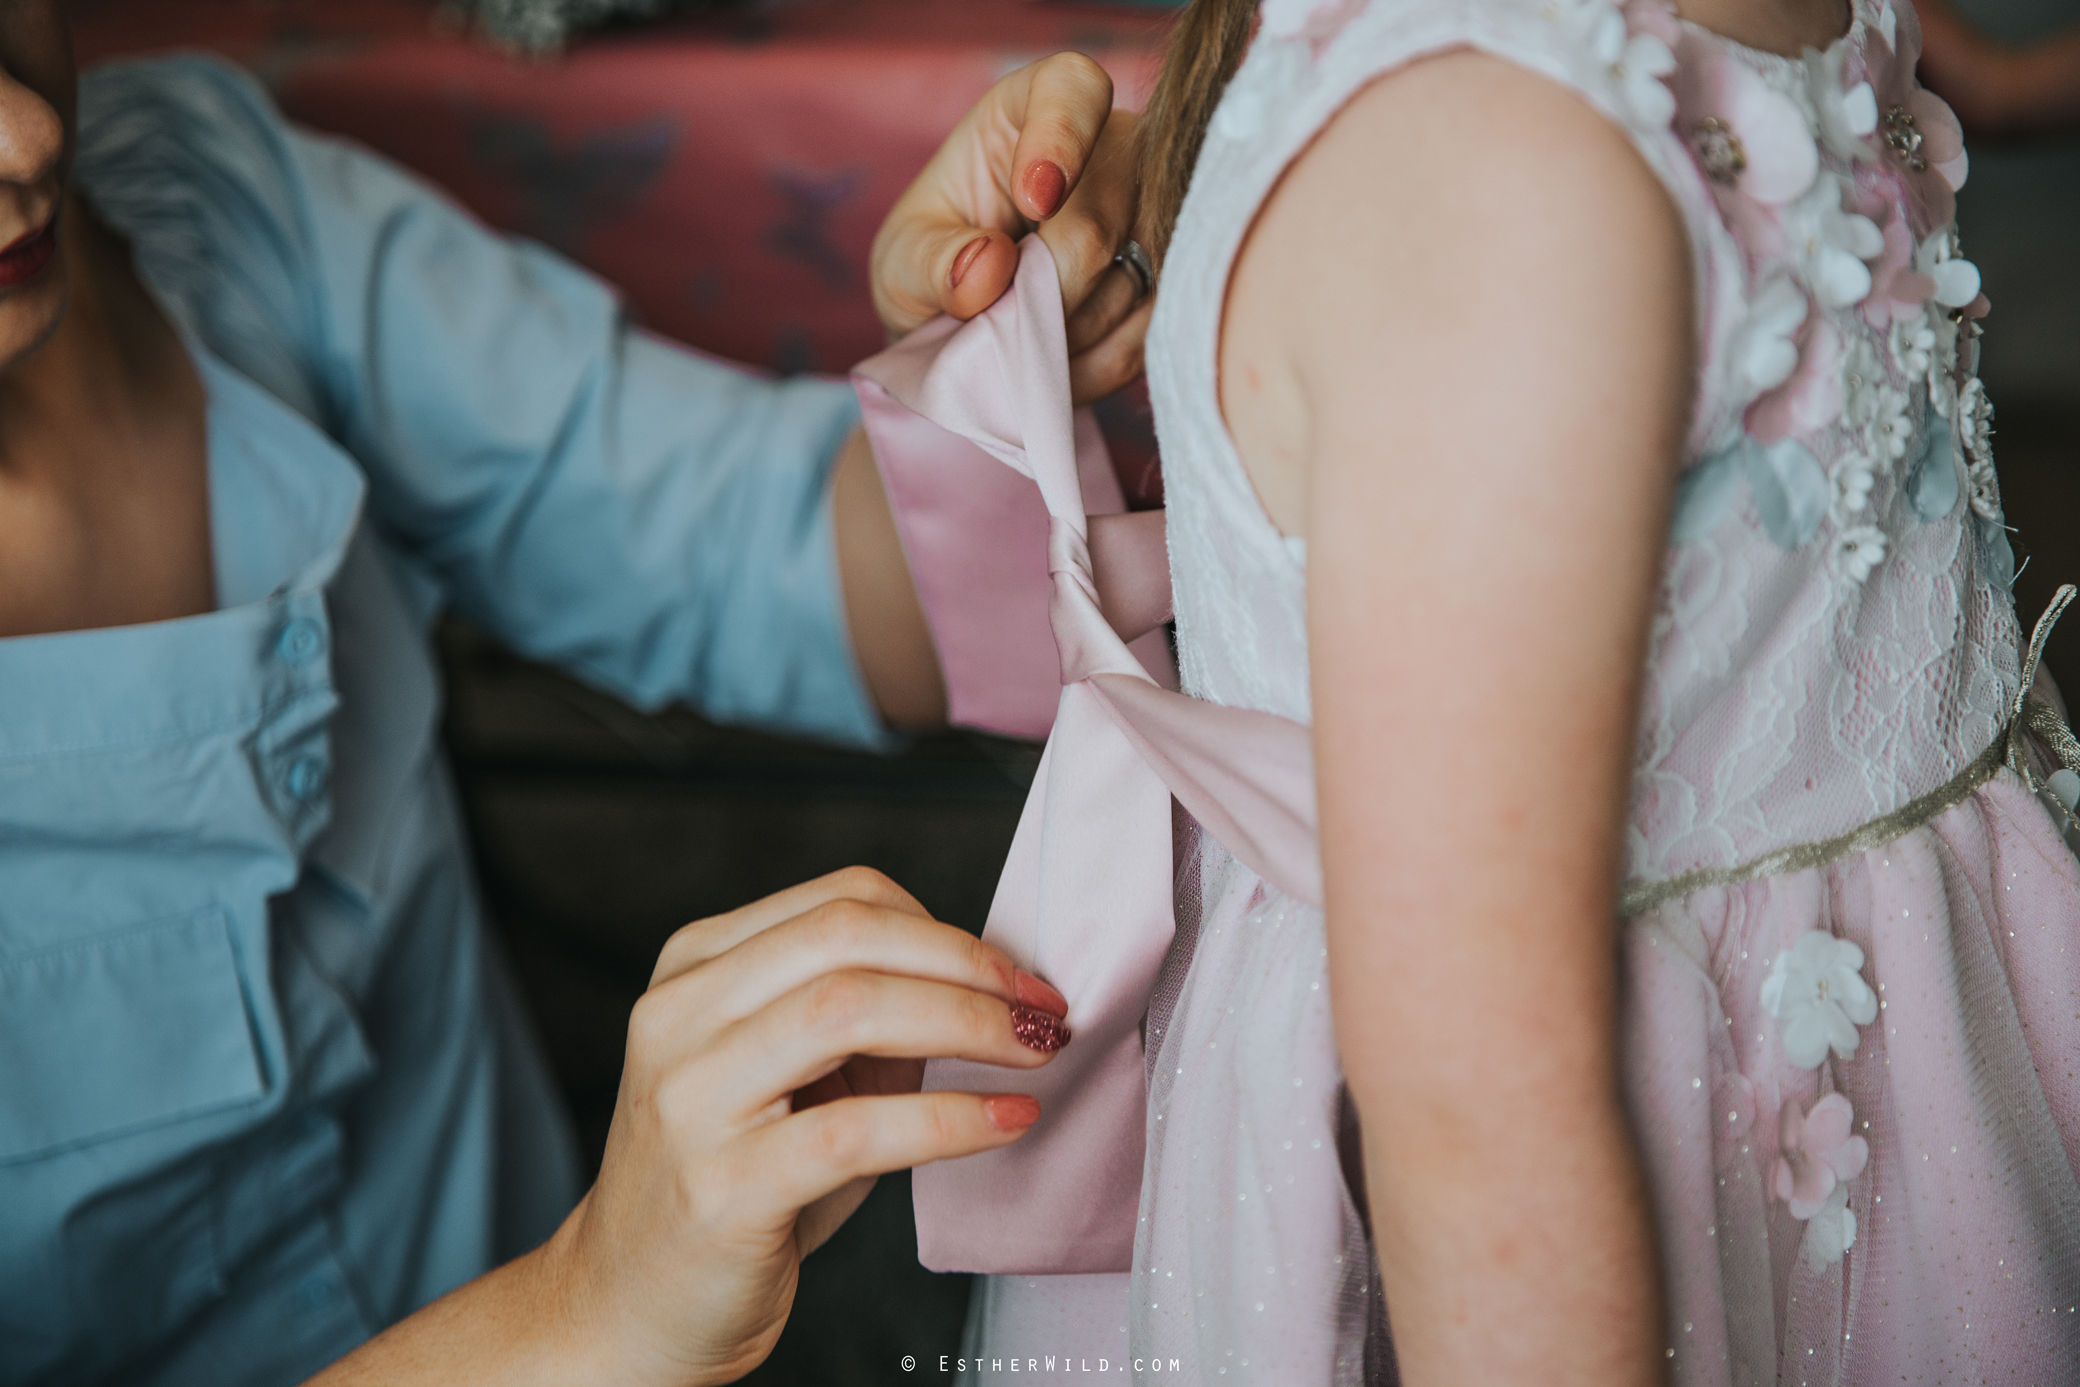 Wedding_Kings_Lynn_Town_Hall_Norfolk_Photographer_Esther_Wild_IMG_0408.jpg